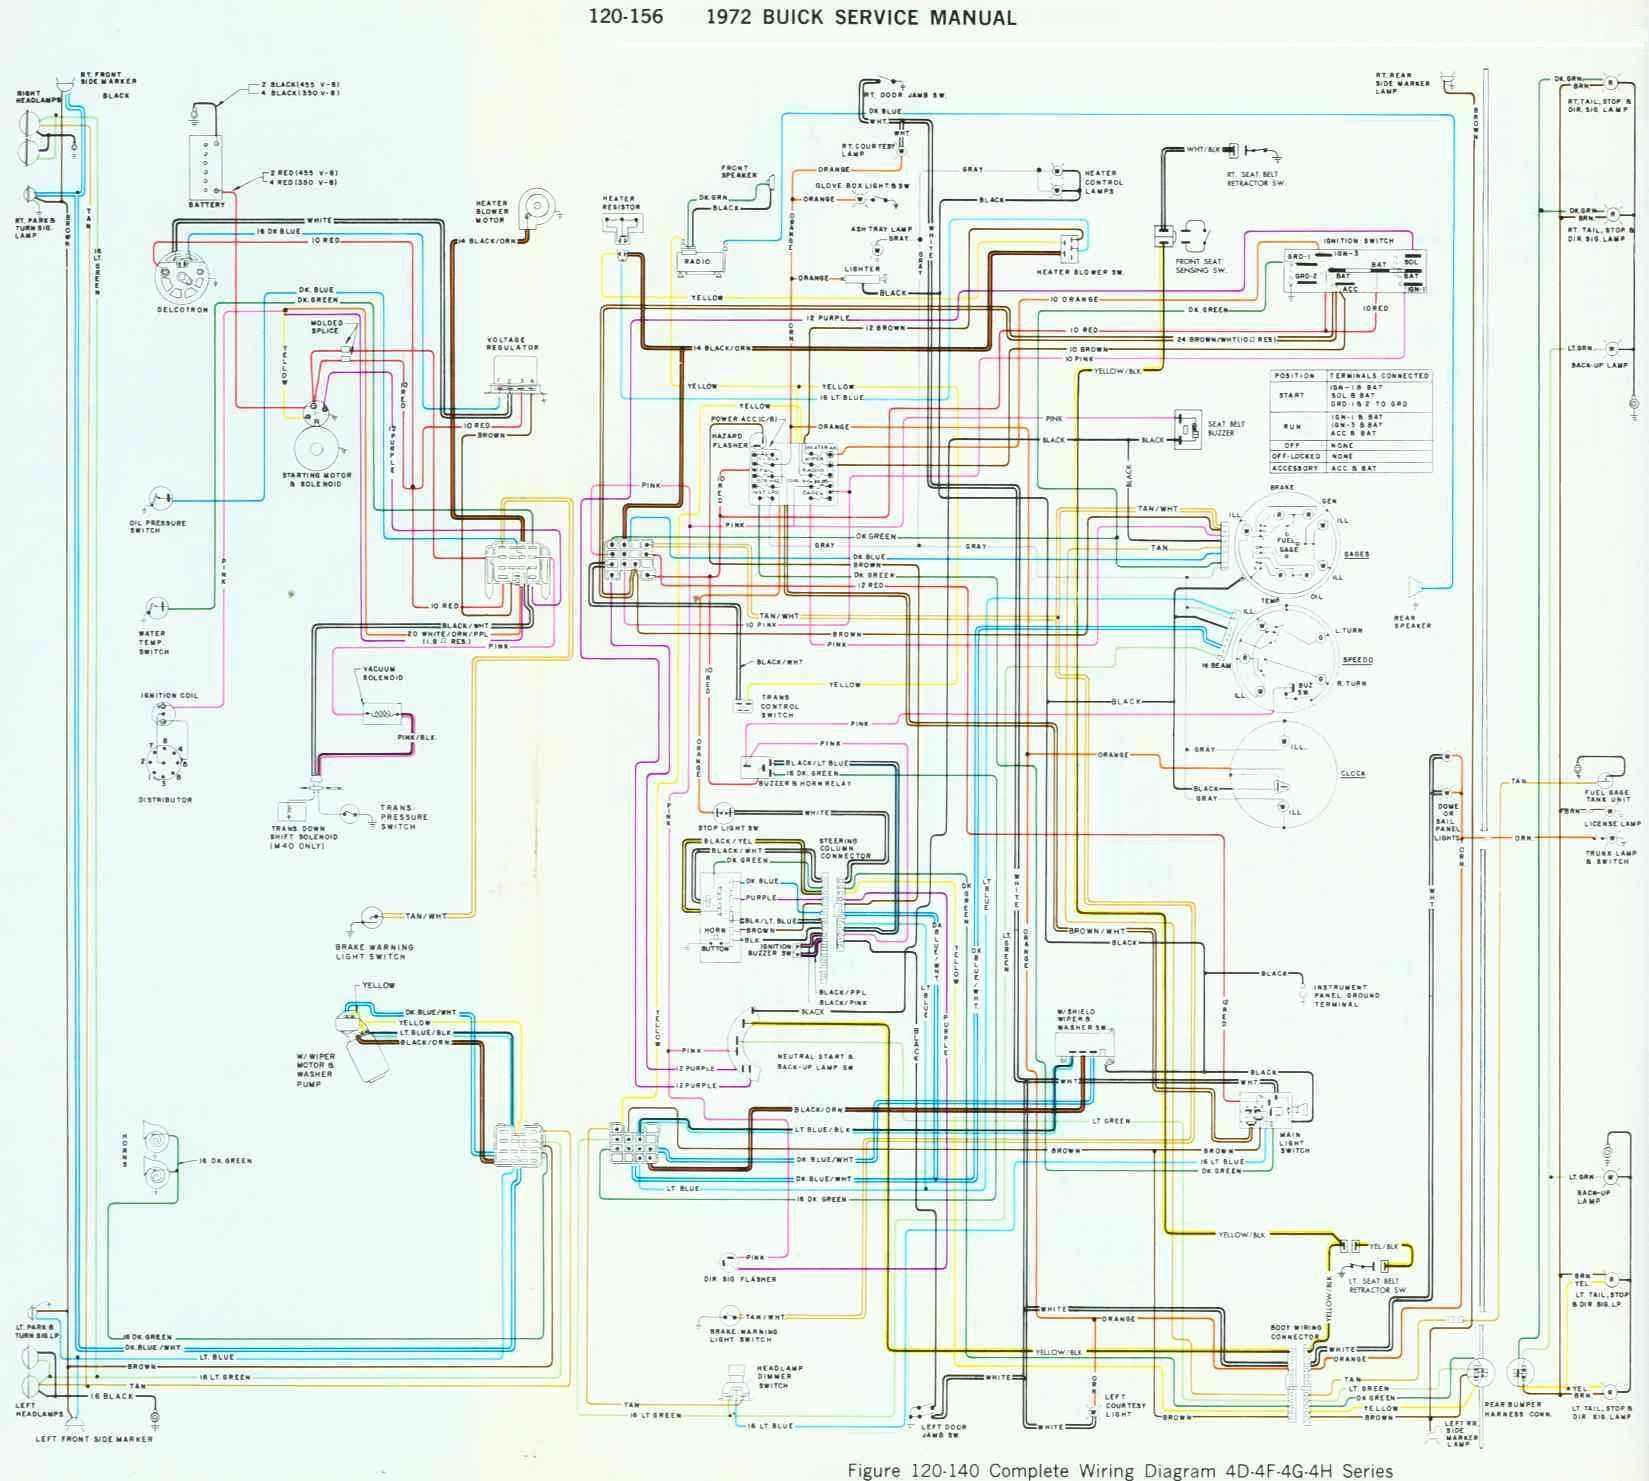 1952 plymouth cranbrook wiring diagram wiring library rh 14 codingcommunity de 1968 dodge dart wiring  [ 1649 x 1481 Pixel ]